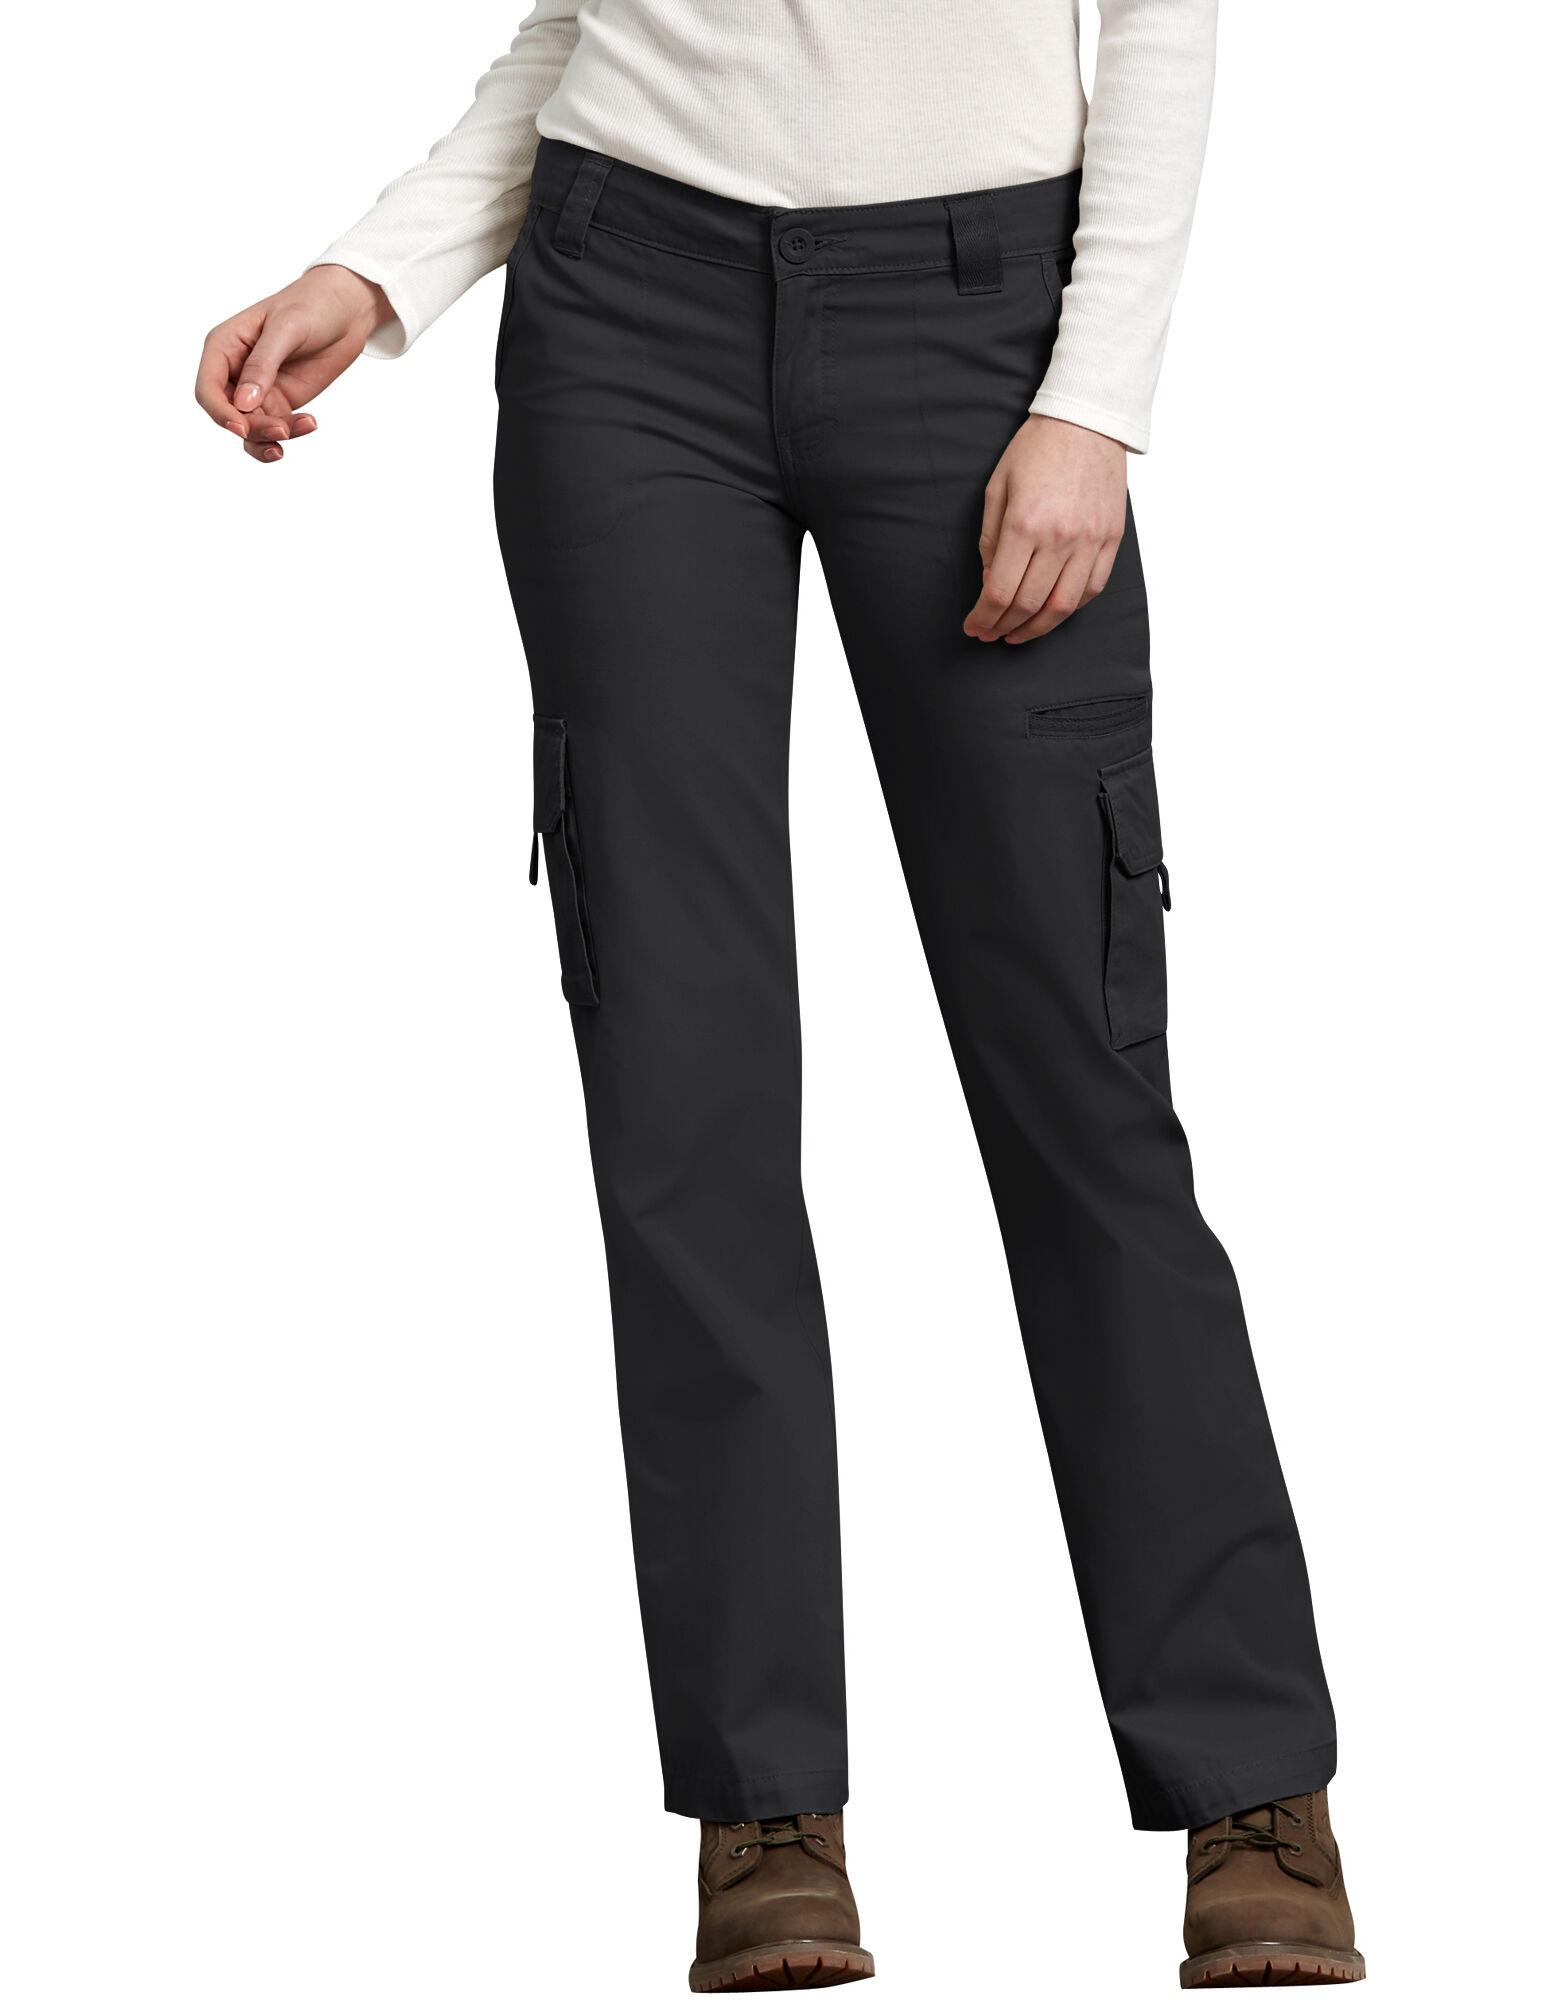 Women Cargo Pants With Pockets – Kiss Me Bang Bang  |Black Cargo Pants For Girls